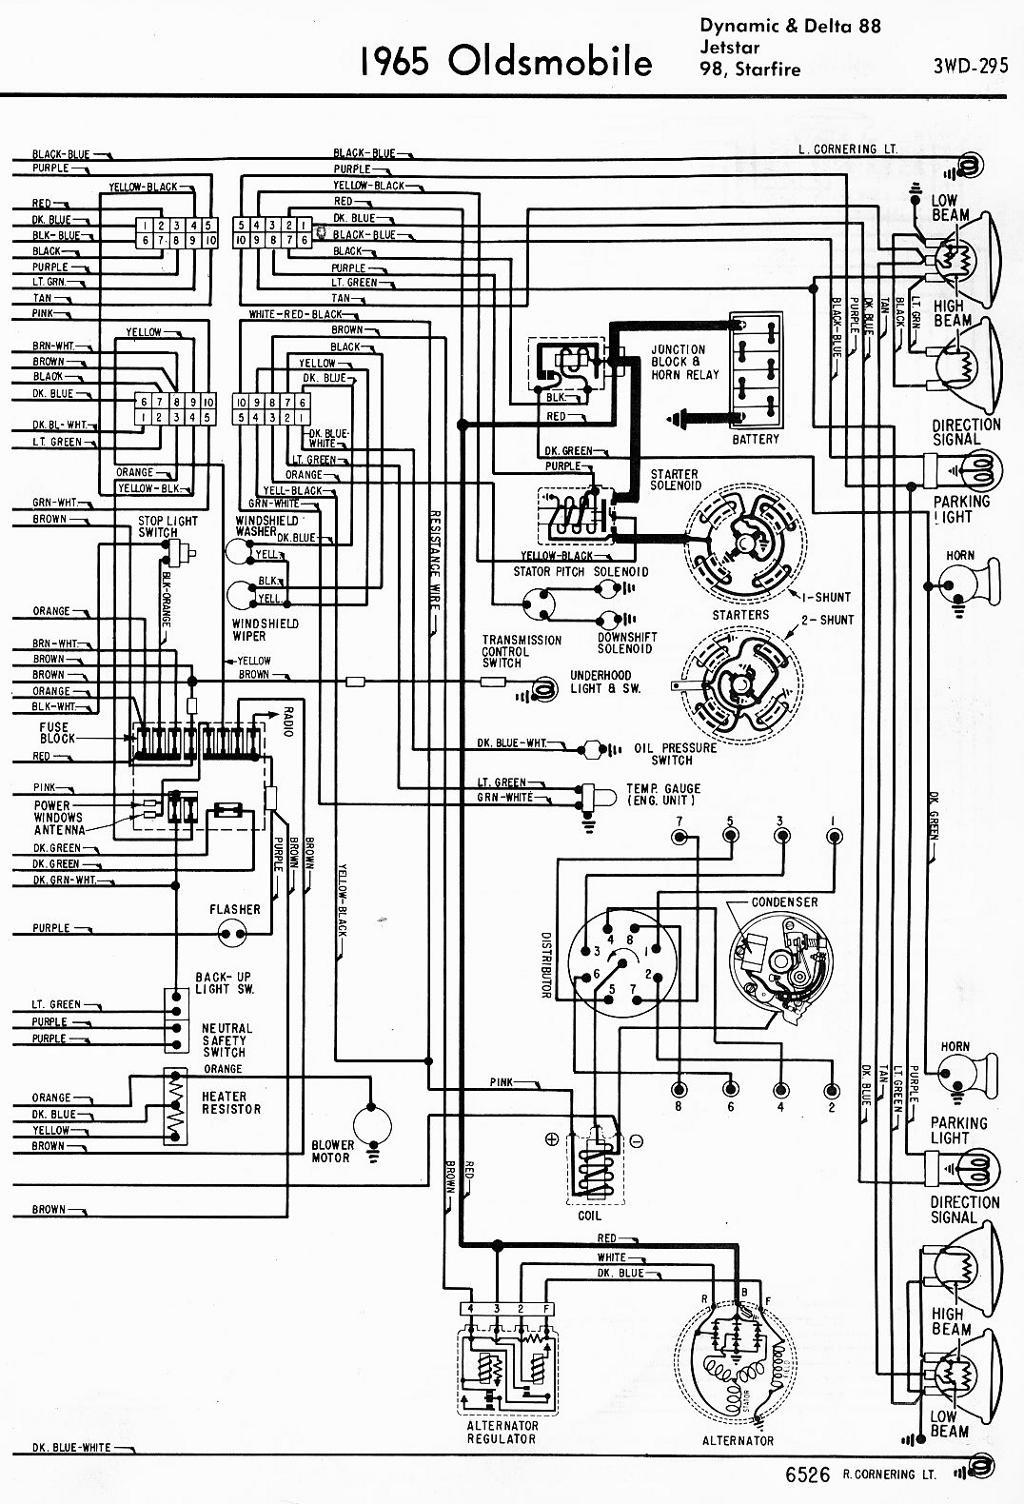 2001 oldsmobile silhouette fuse diagram 2007 pontiac grand prix source 2001 oldsmobile silhouette wiring diagram [ 1024 x 1504 Pixel ]